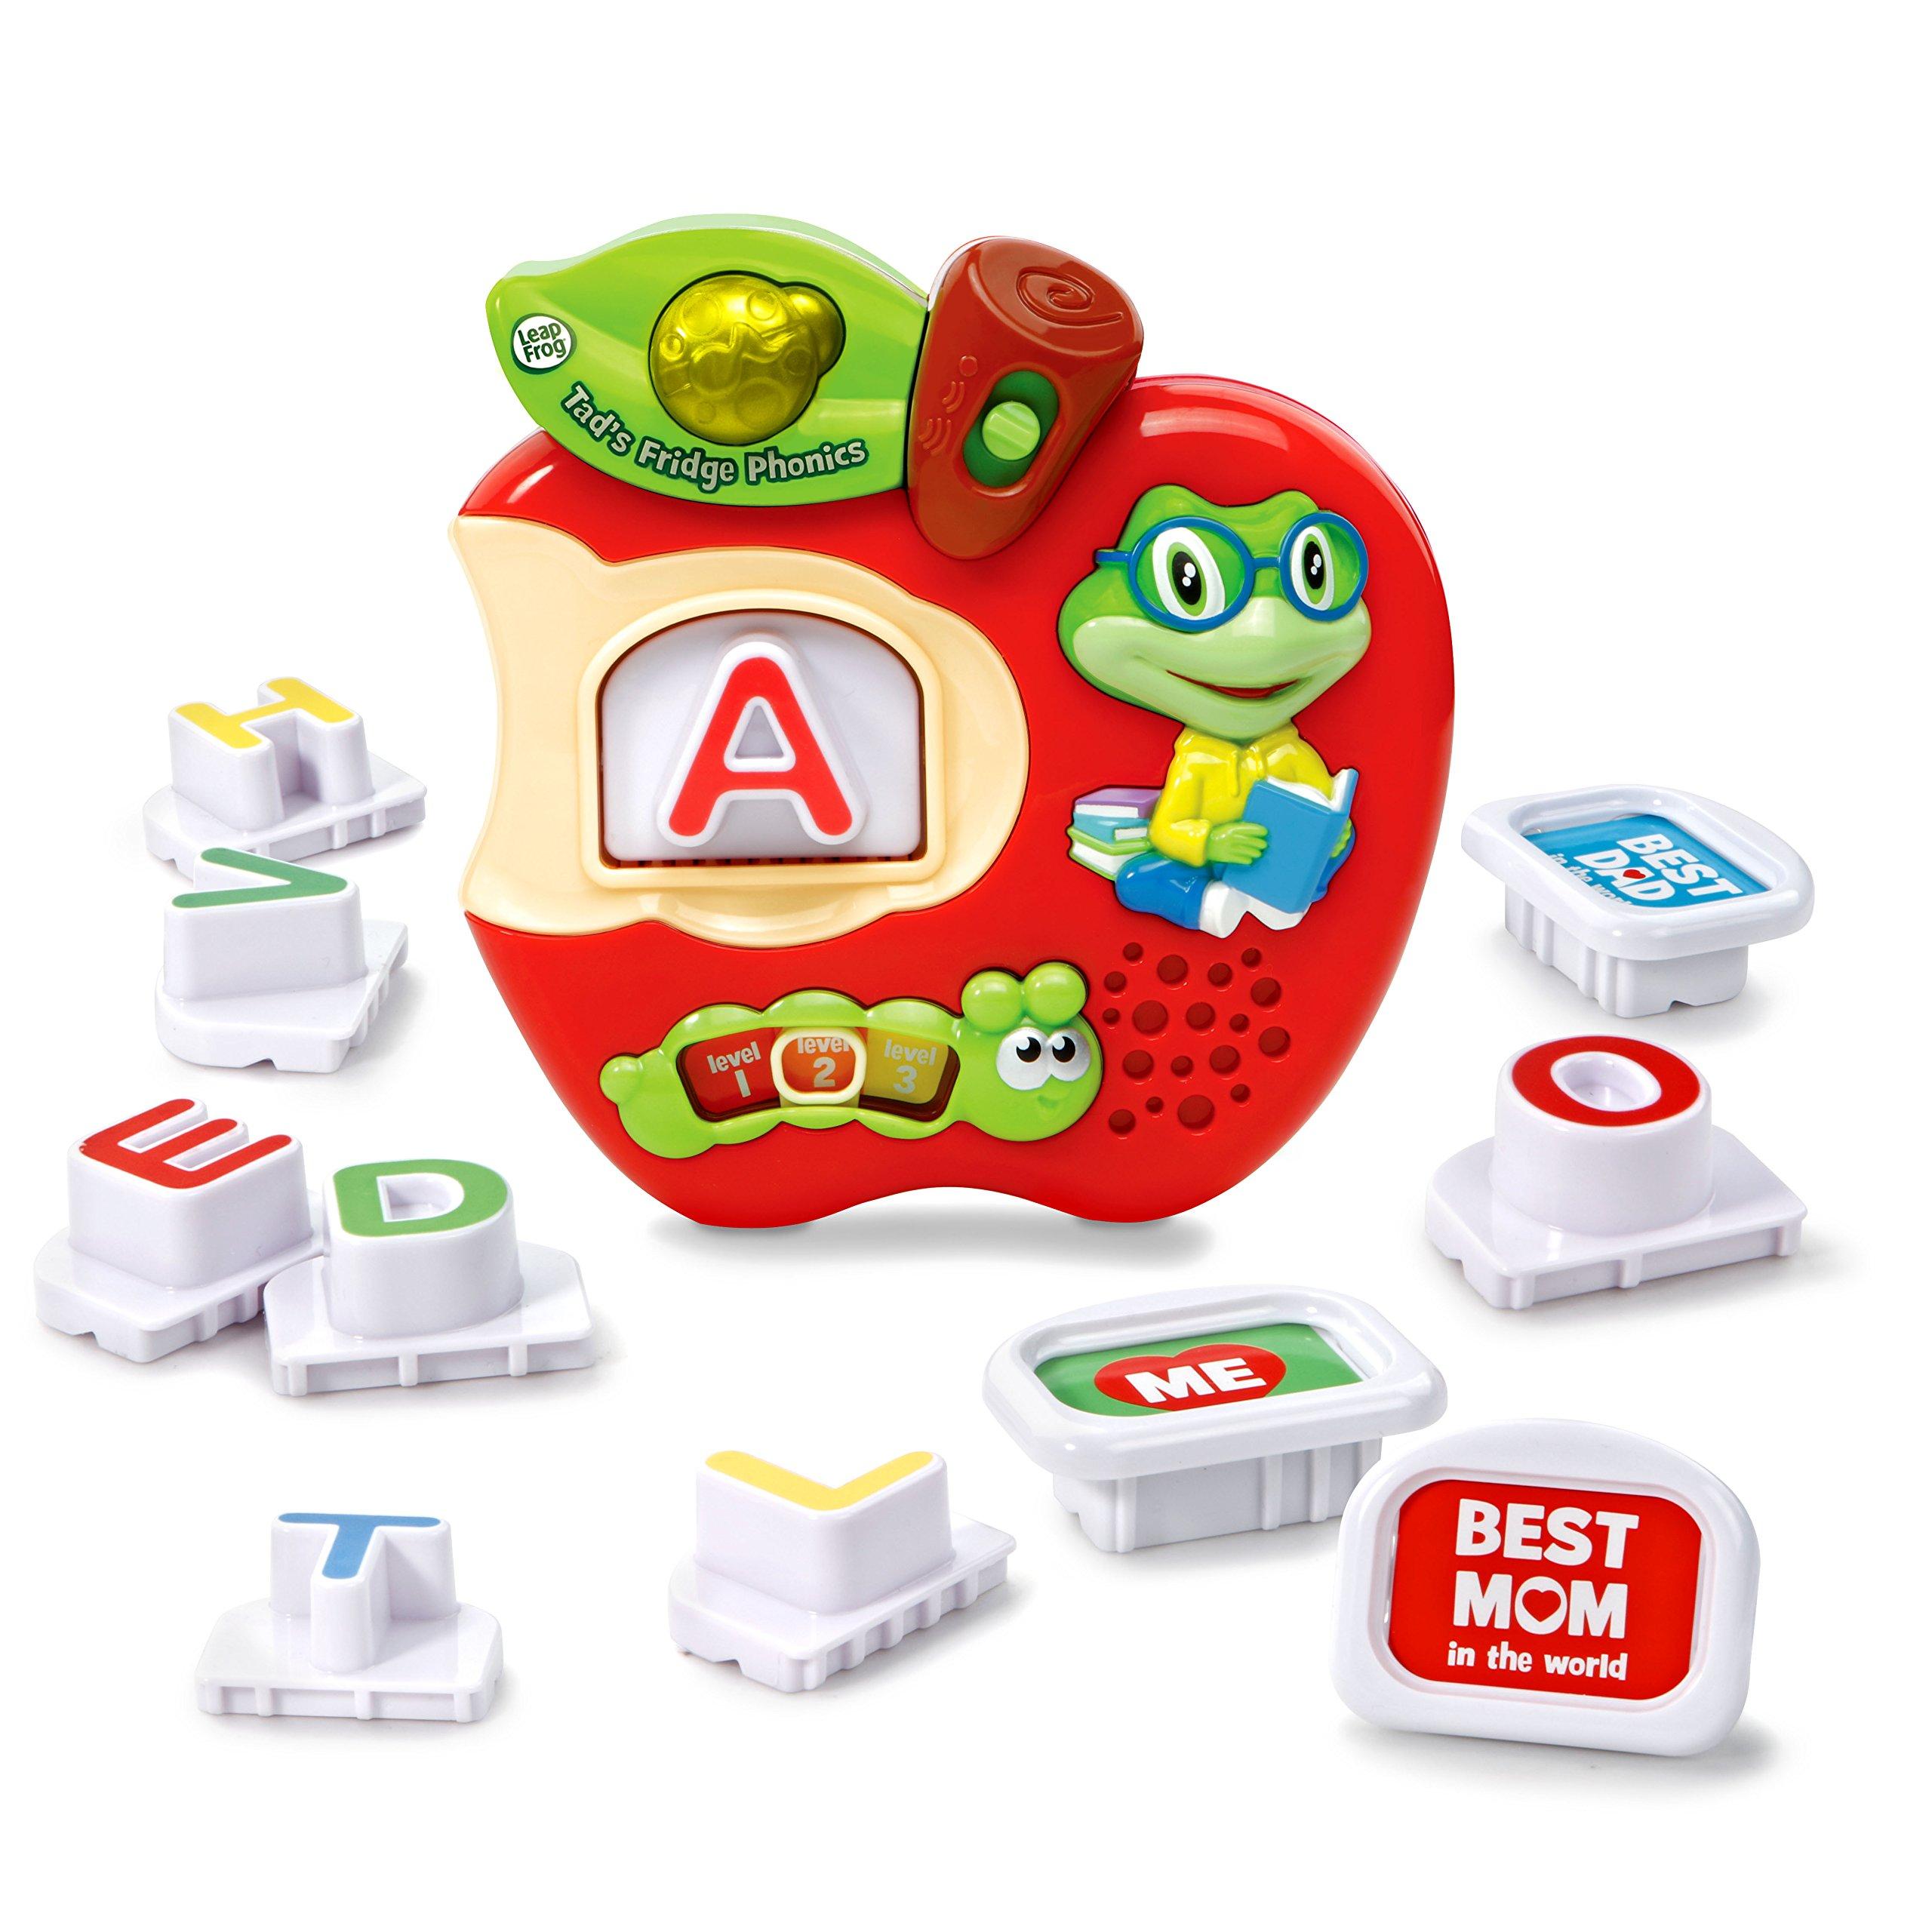 LeapFrog Tad's Fridge Phonics Magnetic Letter Set Toy